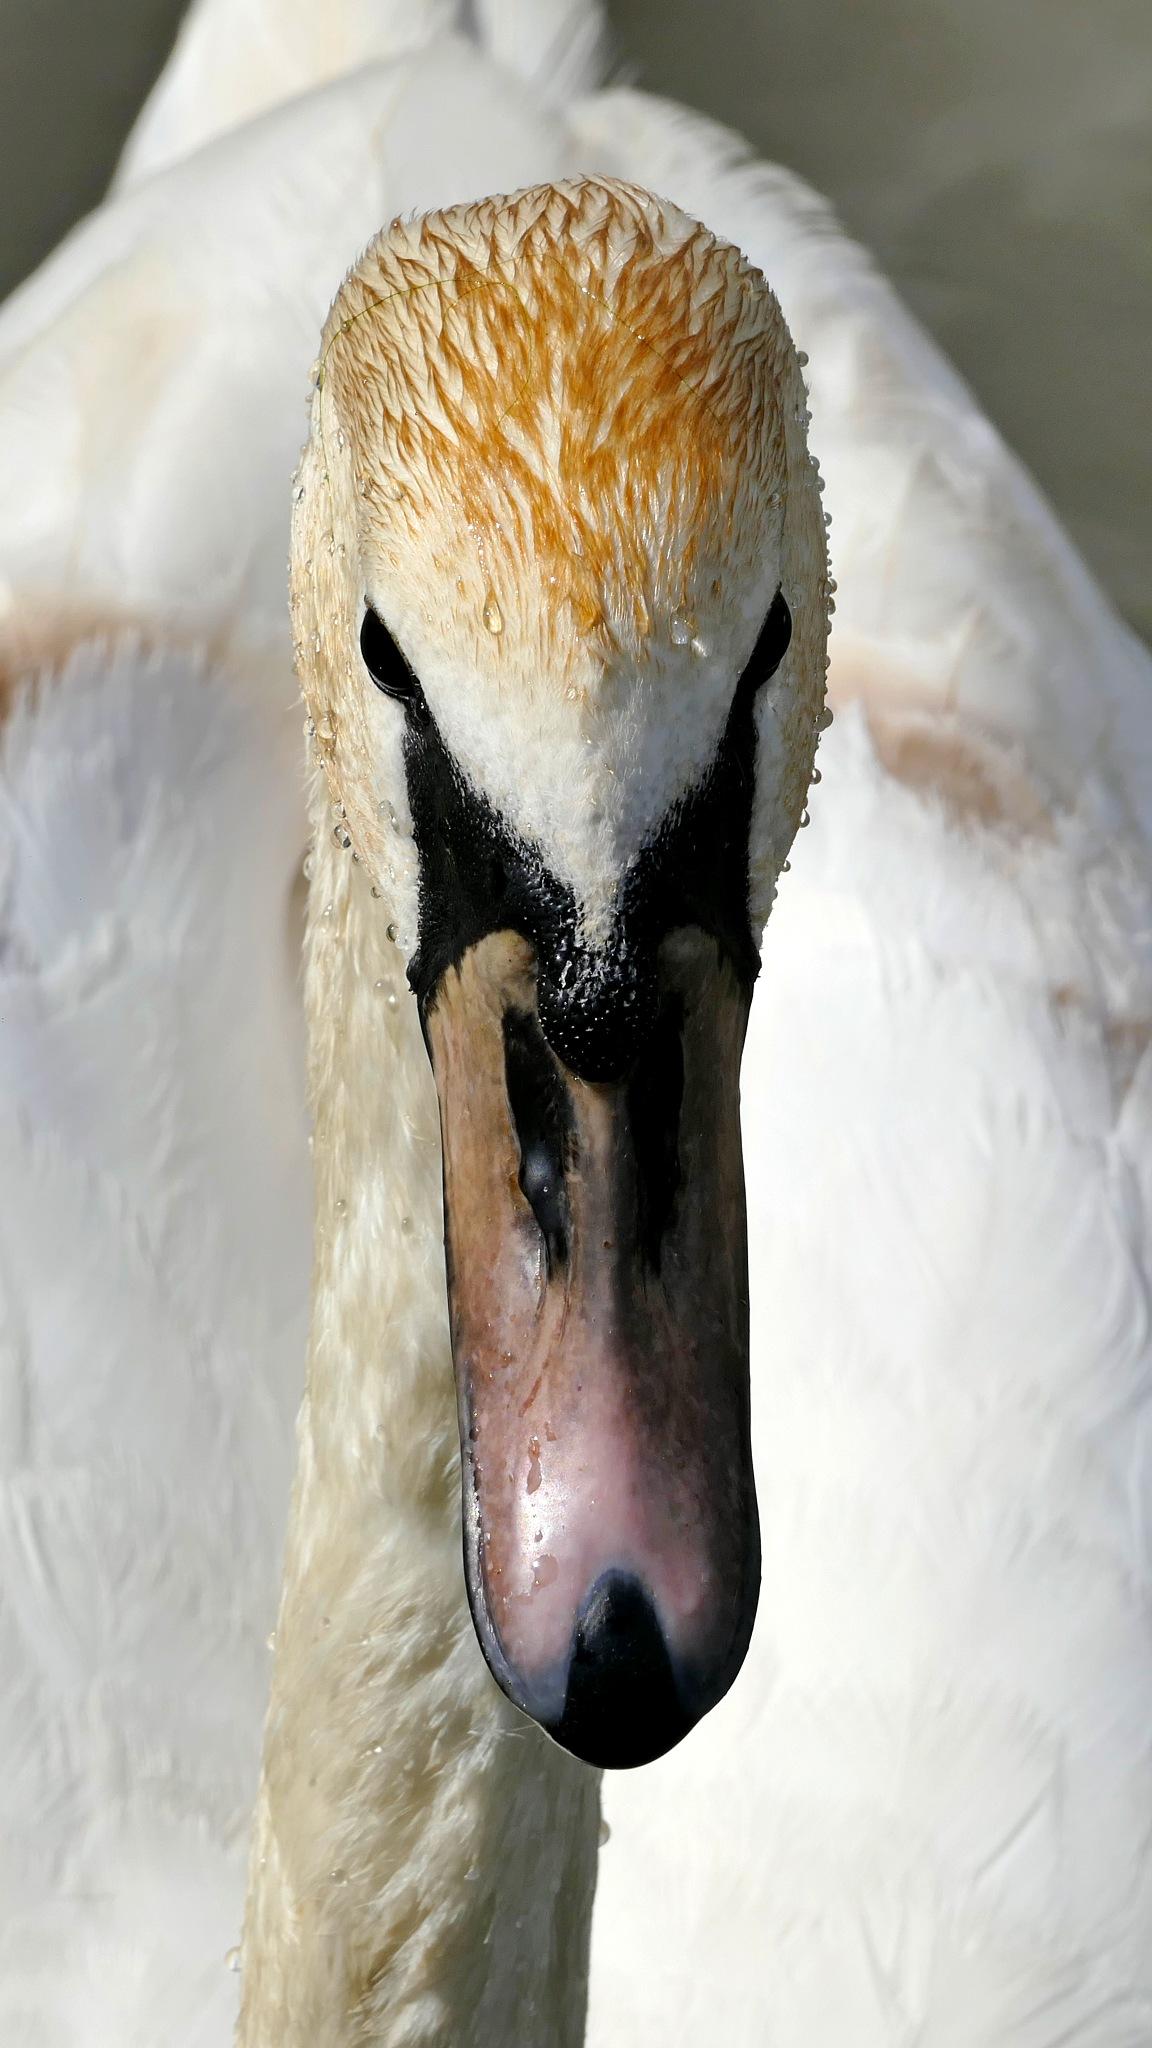 Ginger Swan by Peter Suggitt